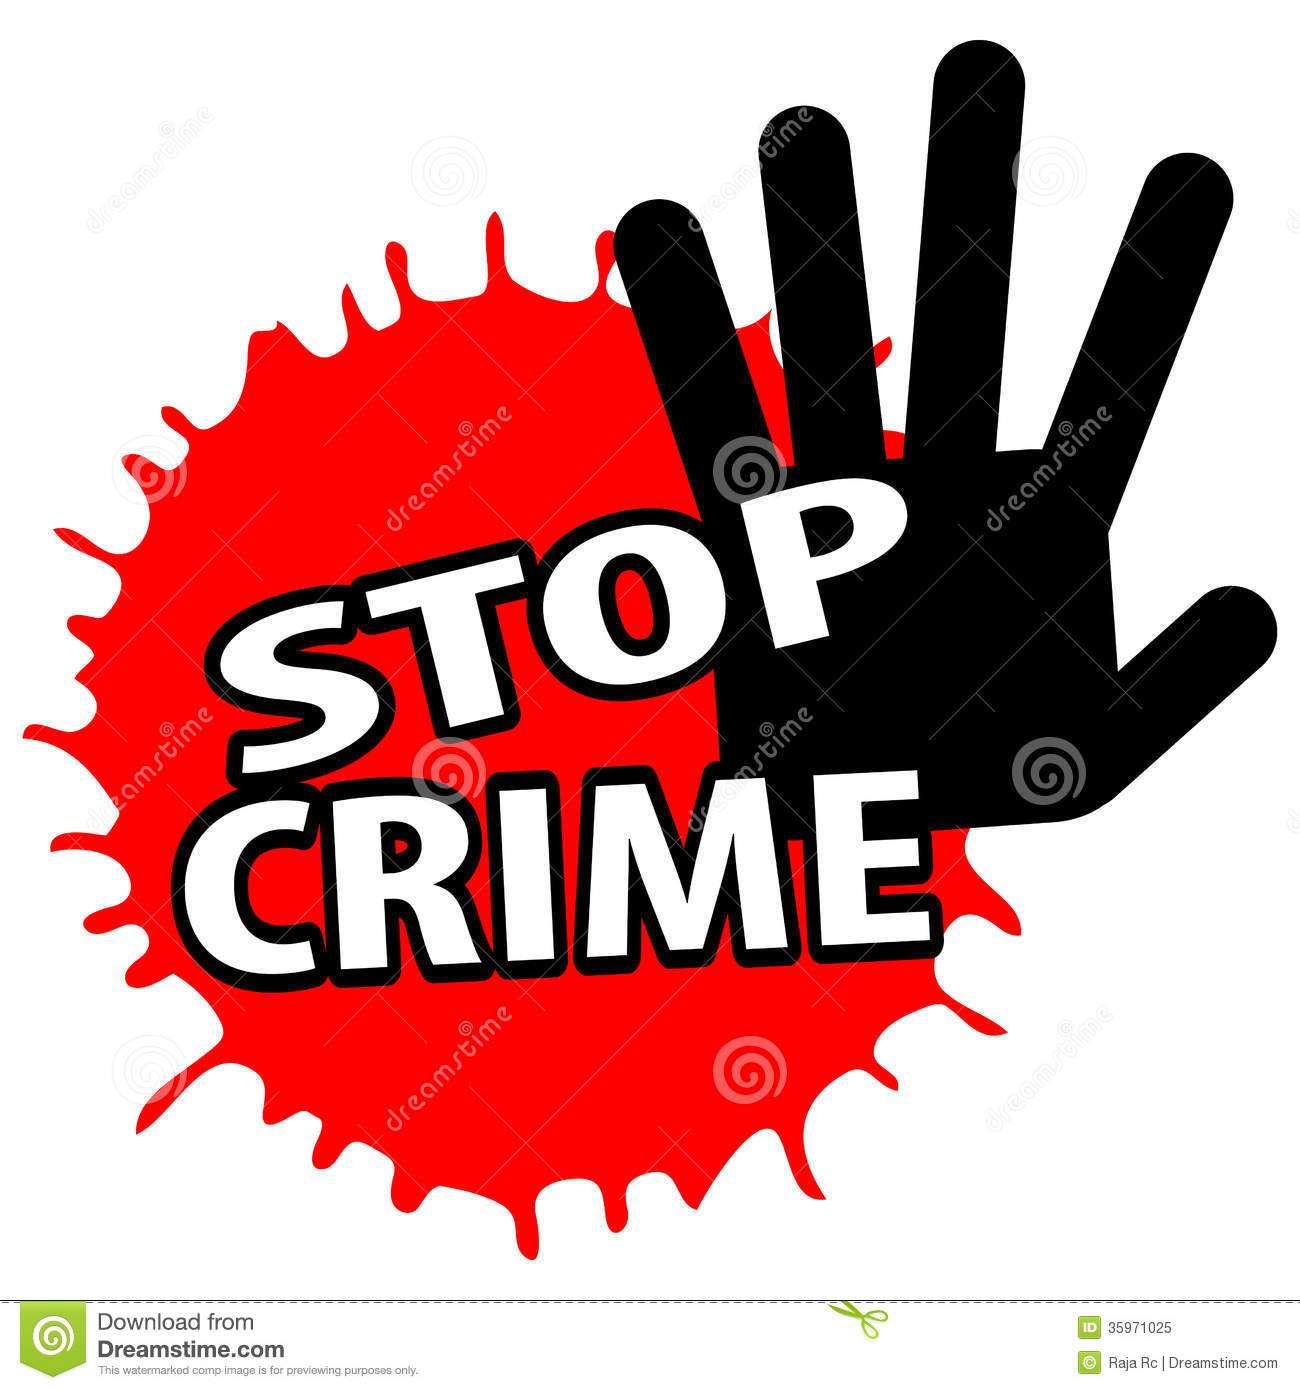 crime clip art free clipart panda free clipart images burglar clipart burglar mask clipart